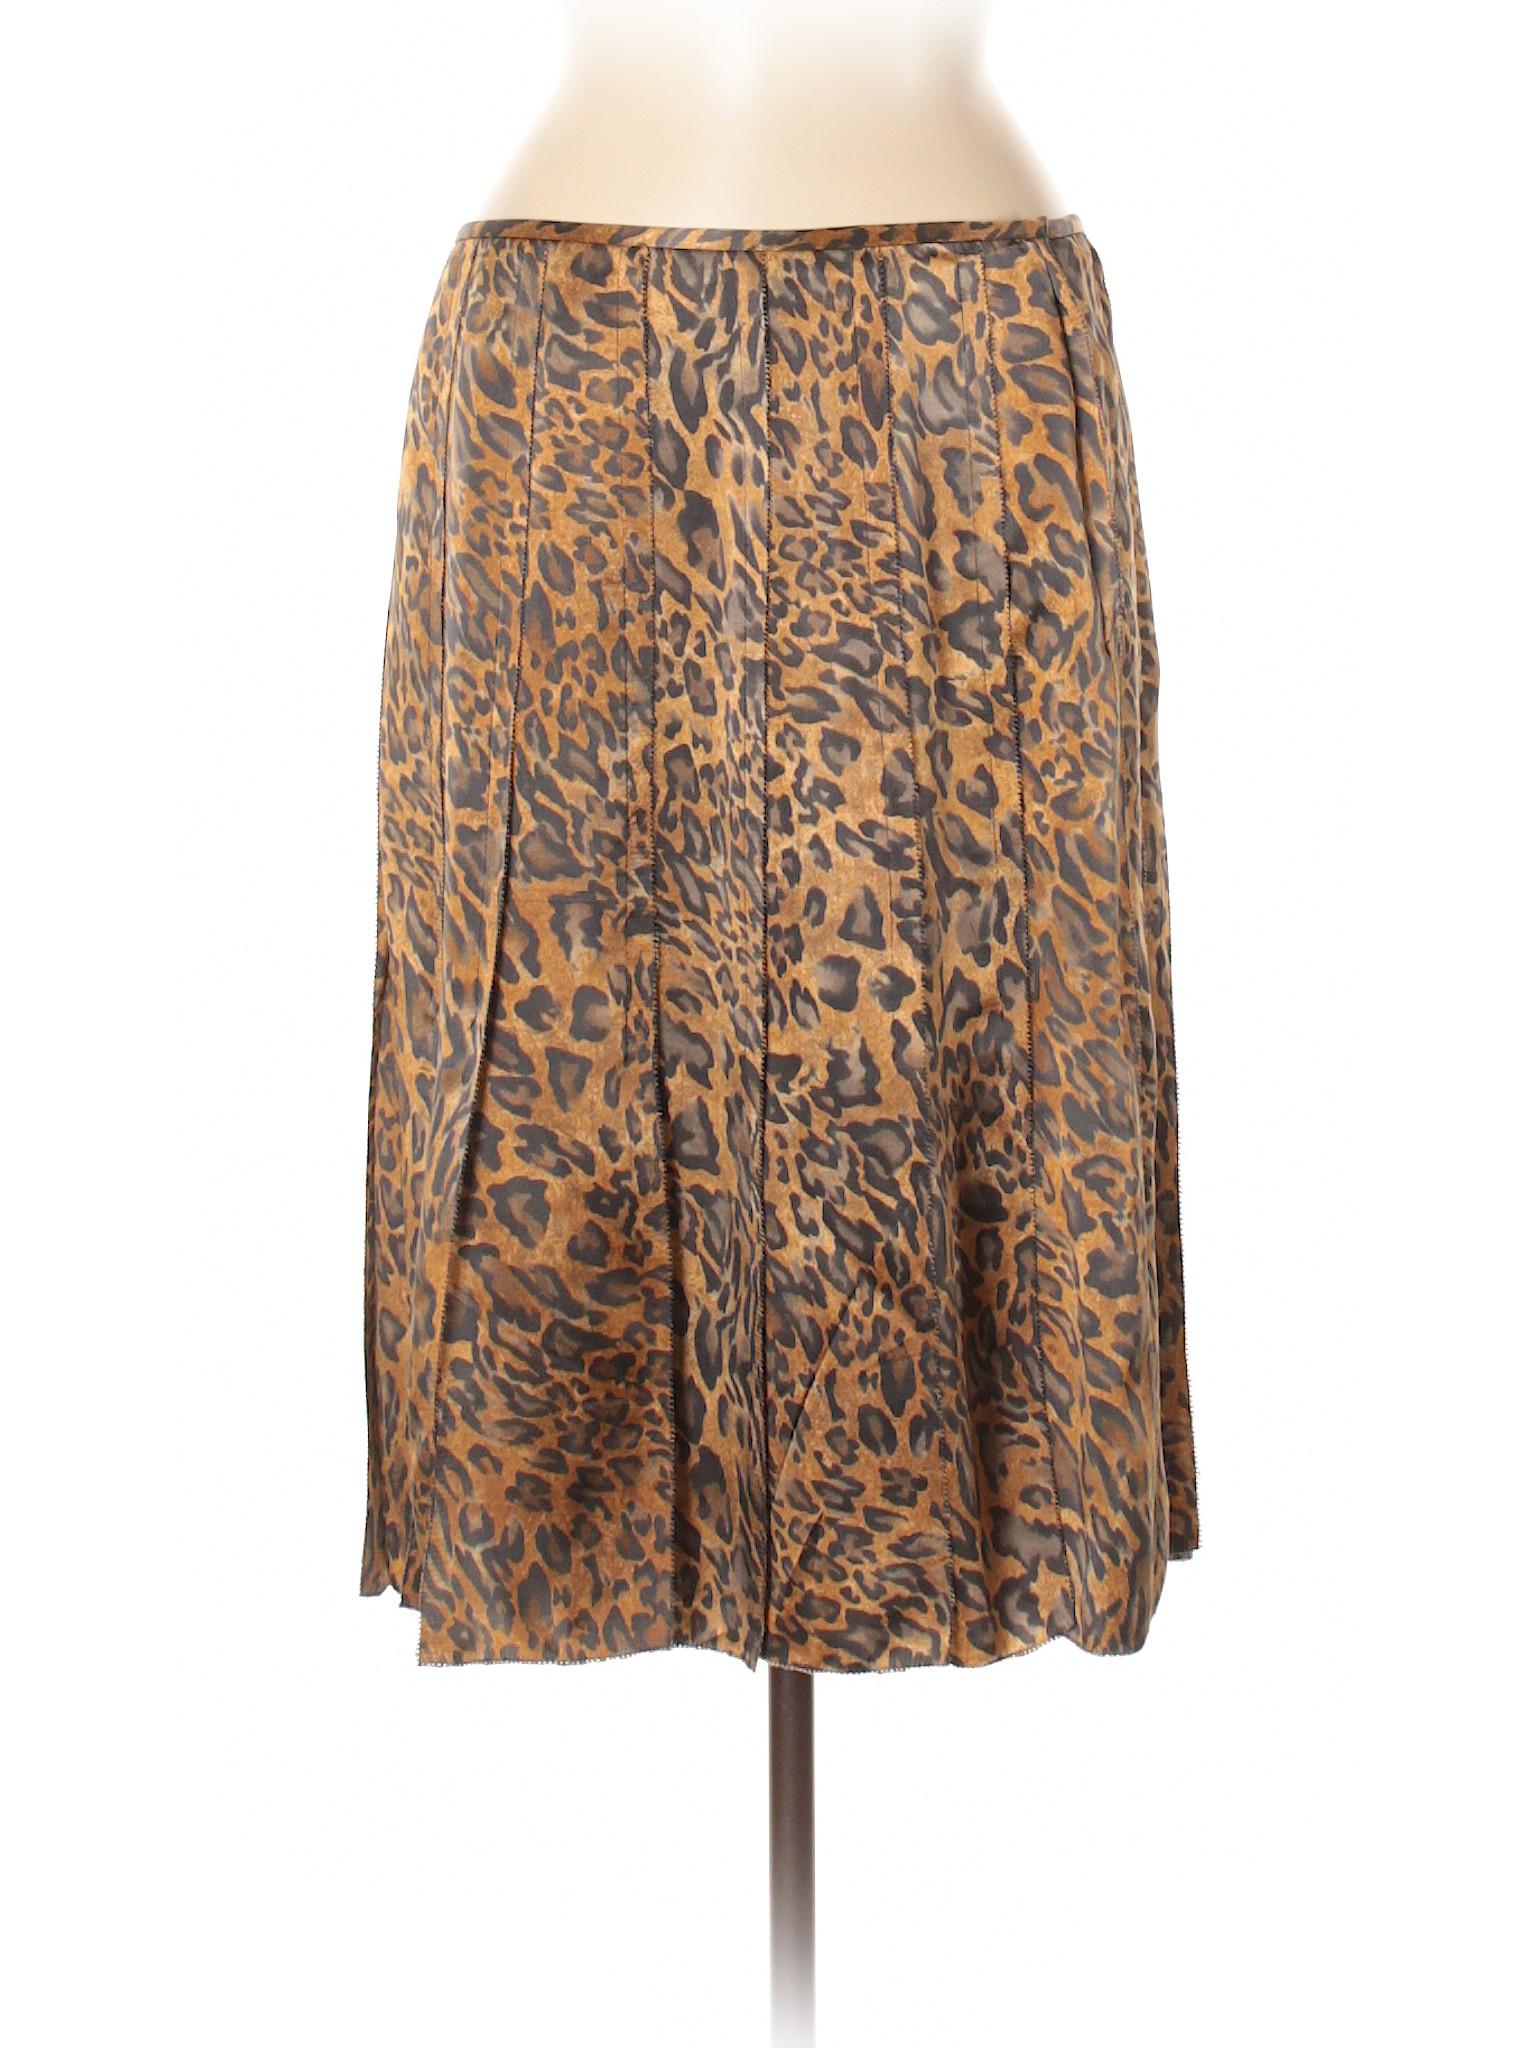 Boutique leisure Boutique Worthington leisure Skirt Silk zddqrF4wx